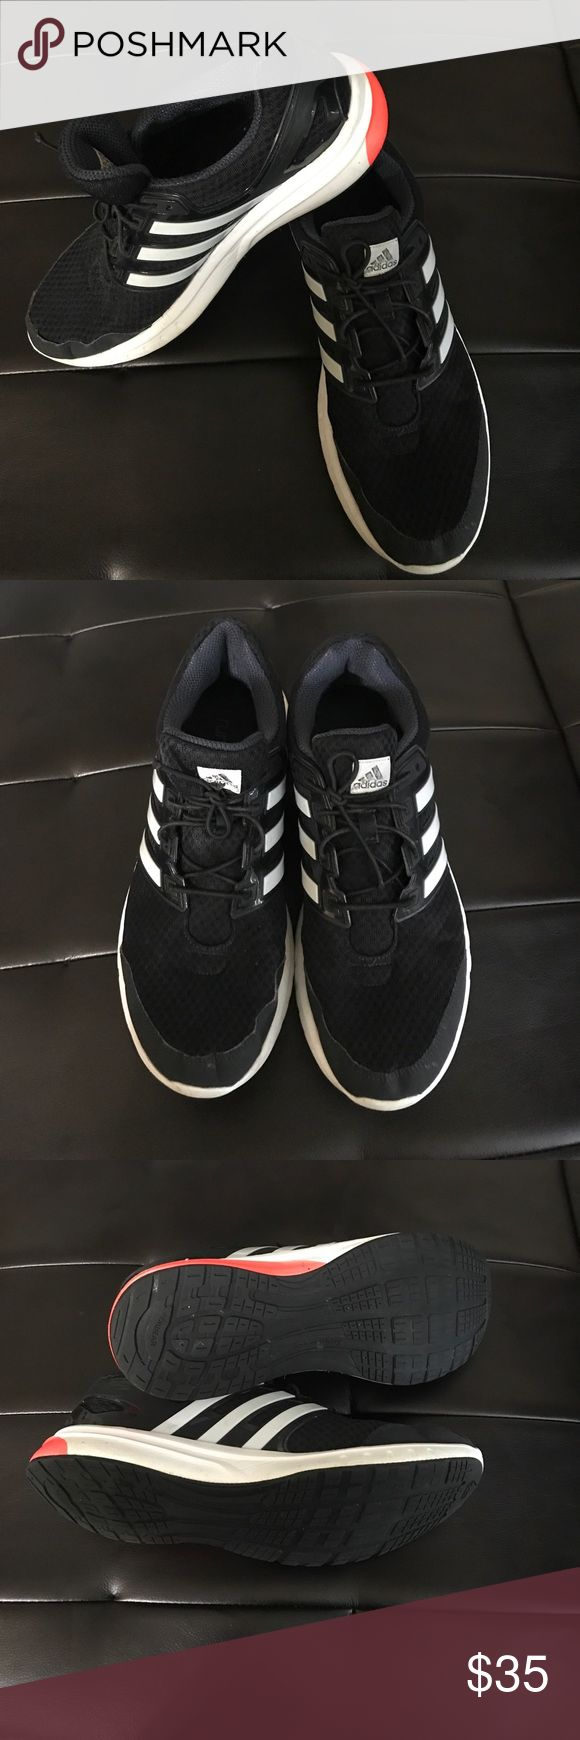 Adidas adiprene + running shoes Gently wear Men's Adidas Adiprene + running shoes size 12 Adidas Shoes Athletic Shoes